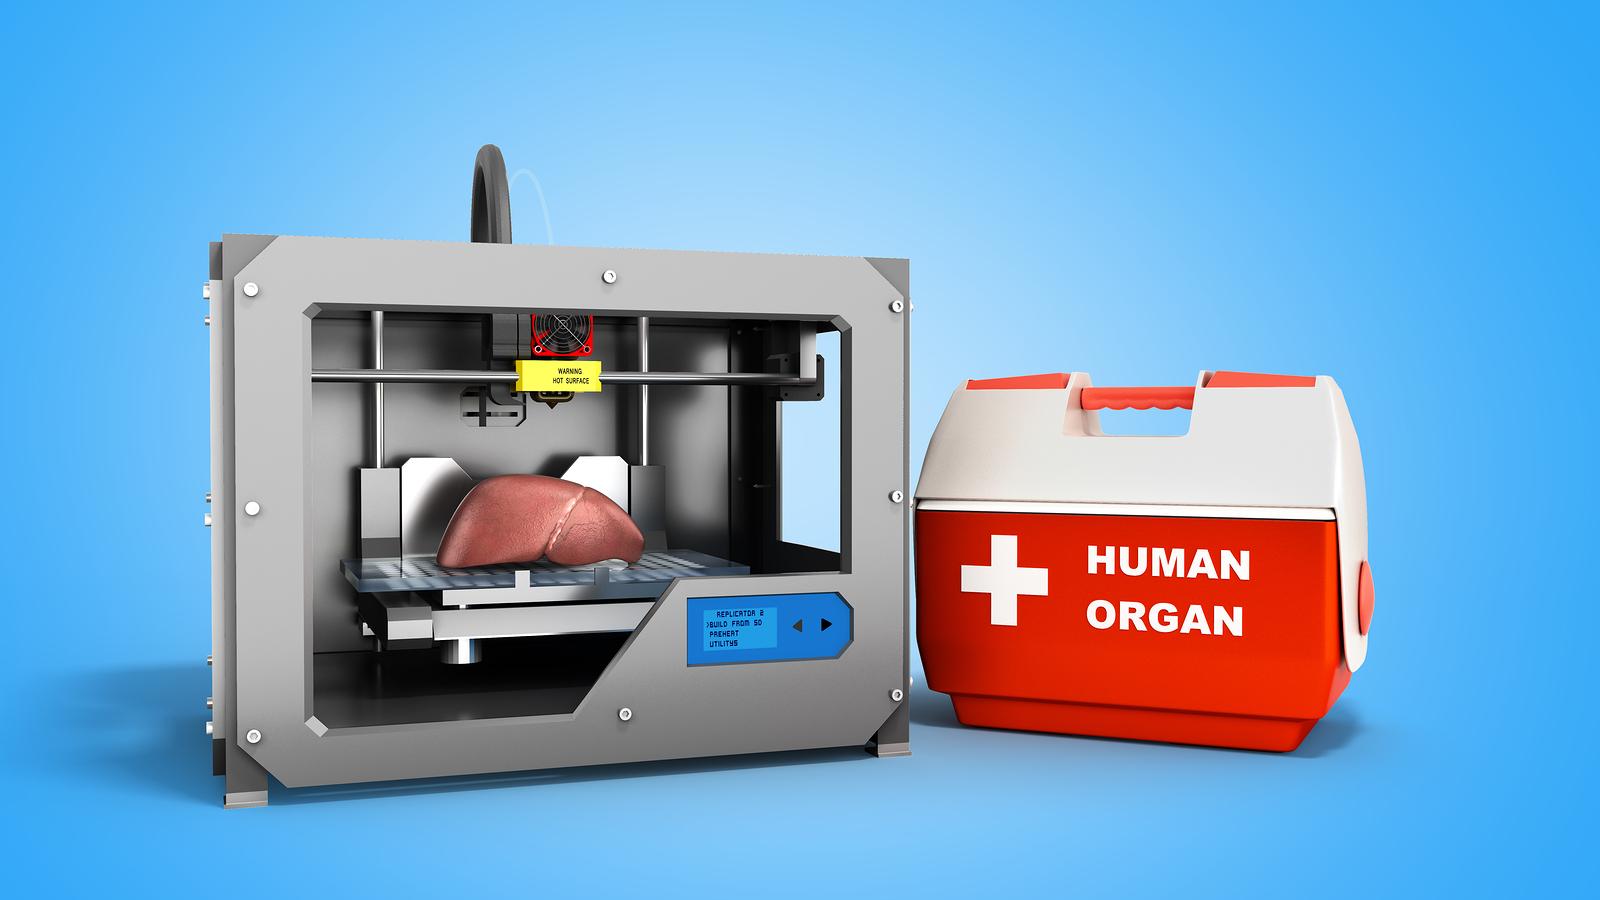 Las bioimpresoras 3D modelan objetos con fluidos. Investigadores experimentan con esta tecnología con el fin de algún día poder imprimir órganos humanos. - Foto: Bigstock